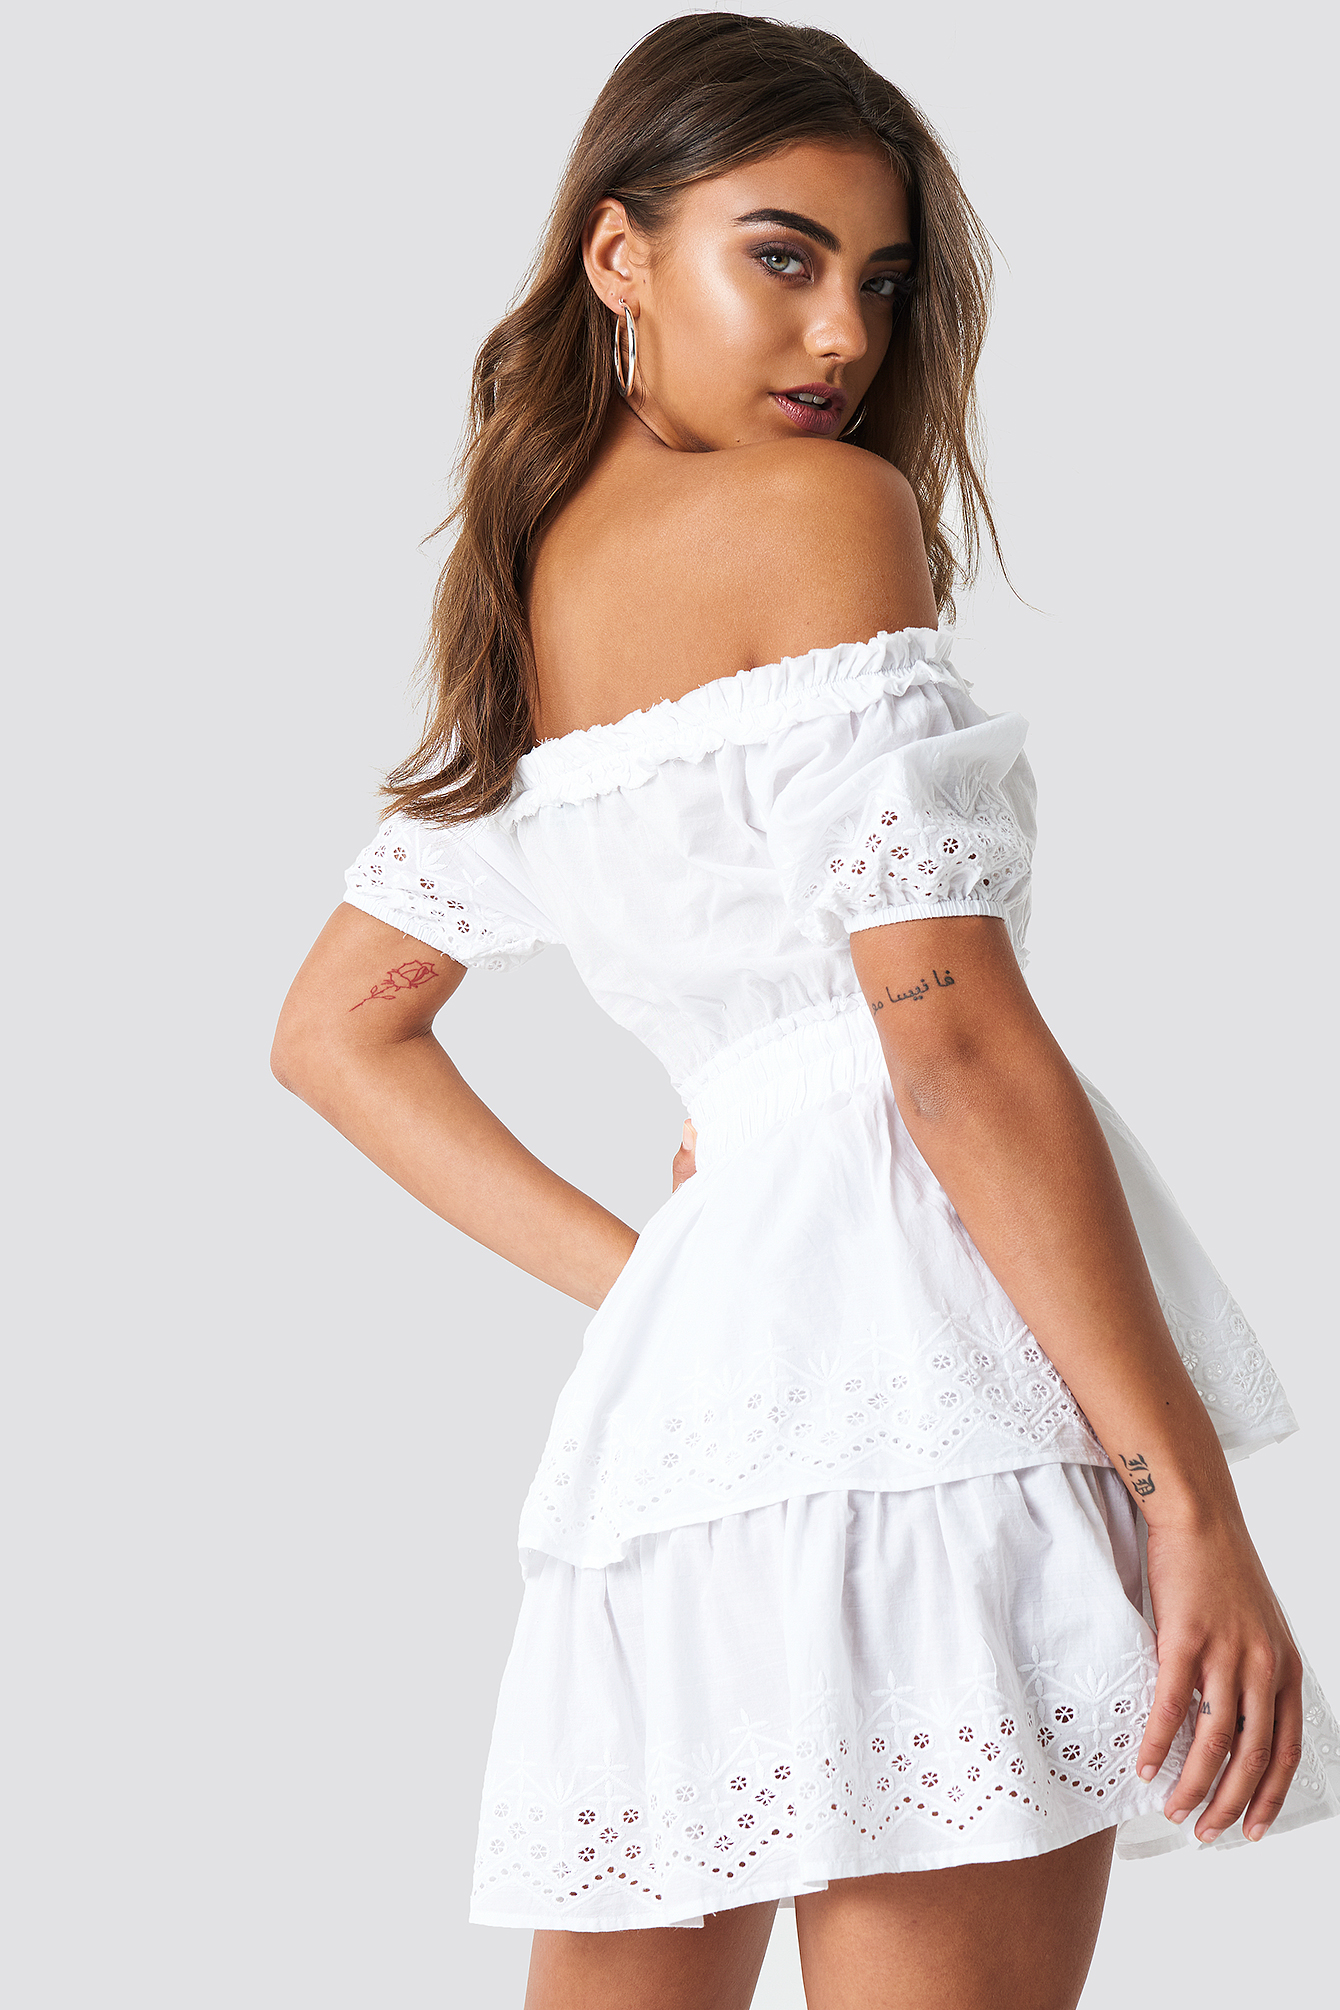 Dernières Collections Prix Pas Cher NA-KD Off Shoulder V Neck Crochet Frill Dress vente p4B5dGhv